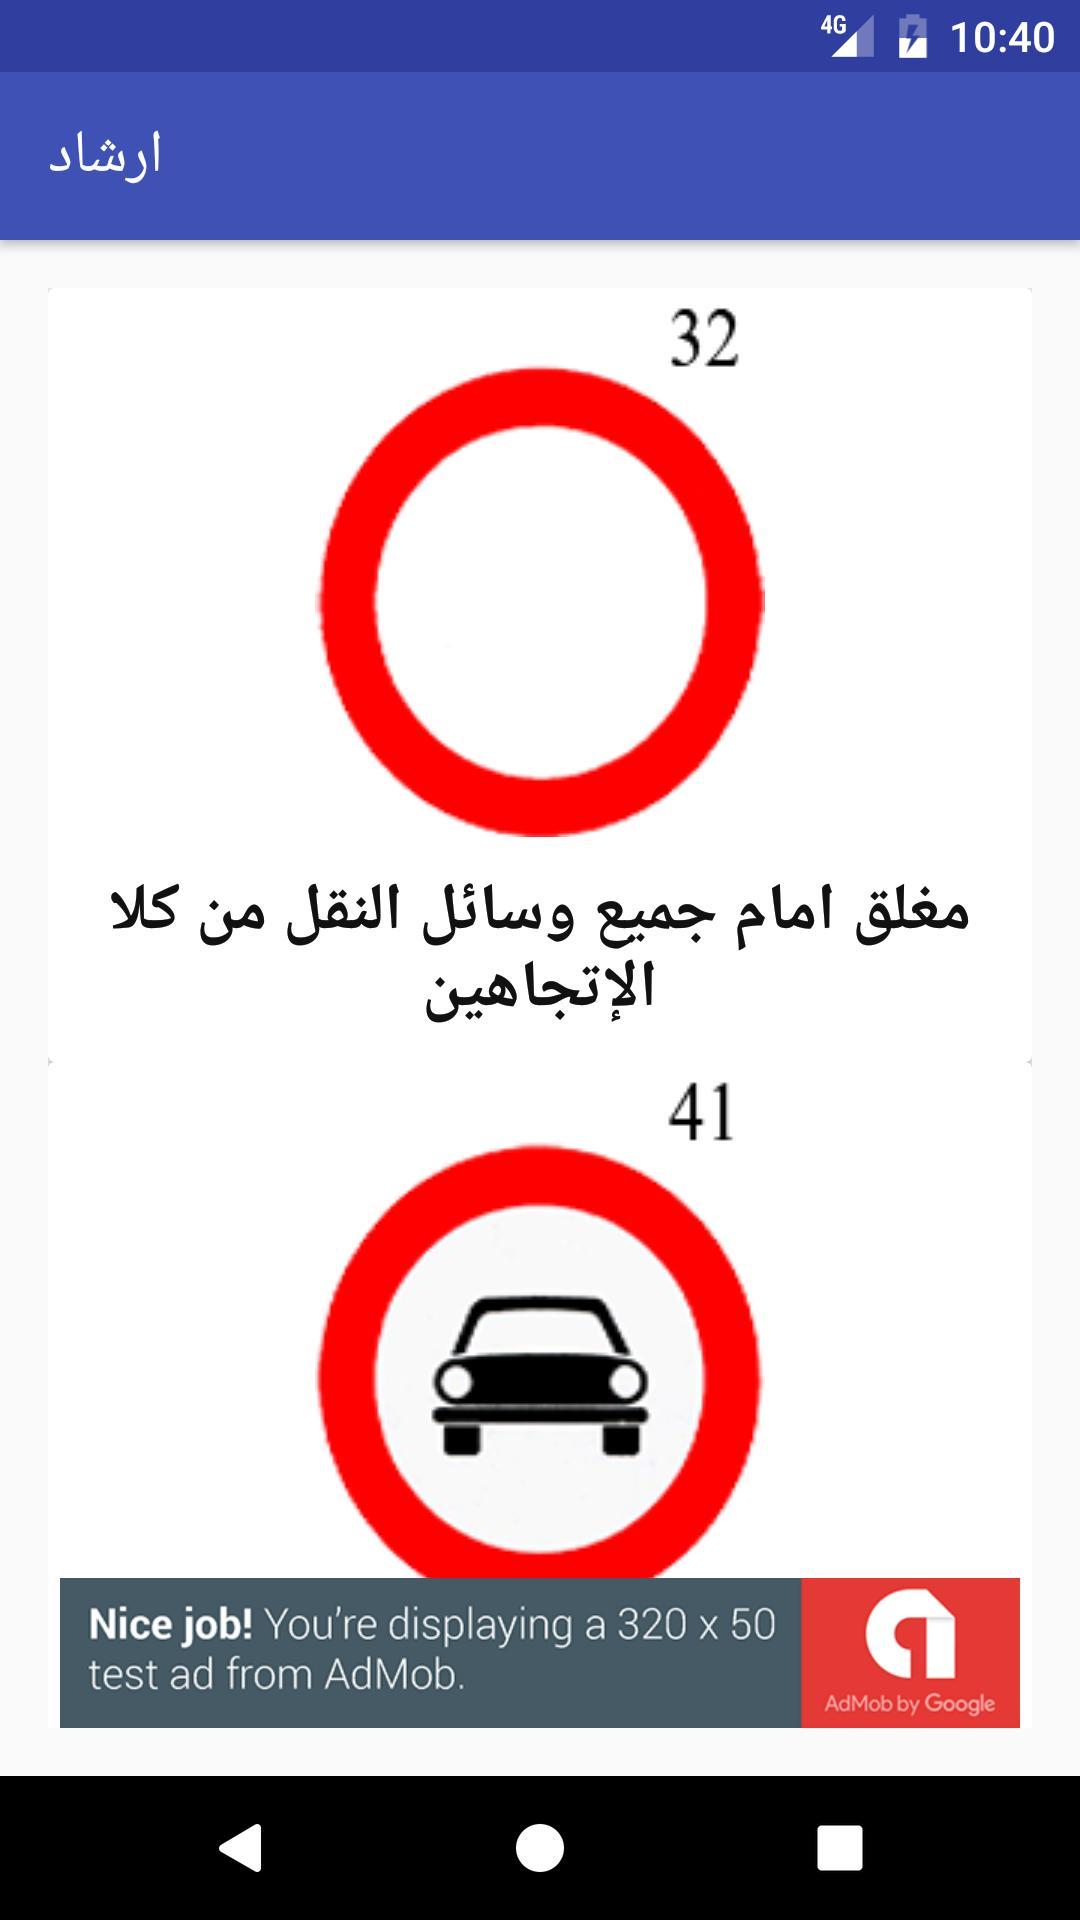 اشارات المرور For Android Apk Download